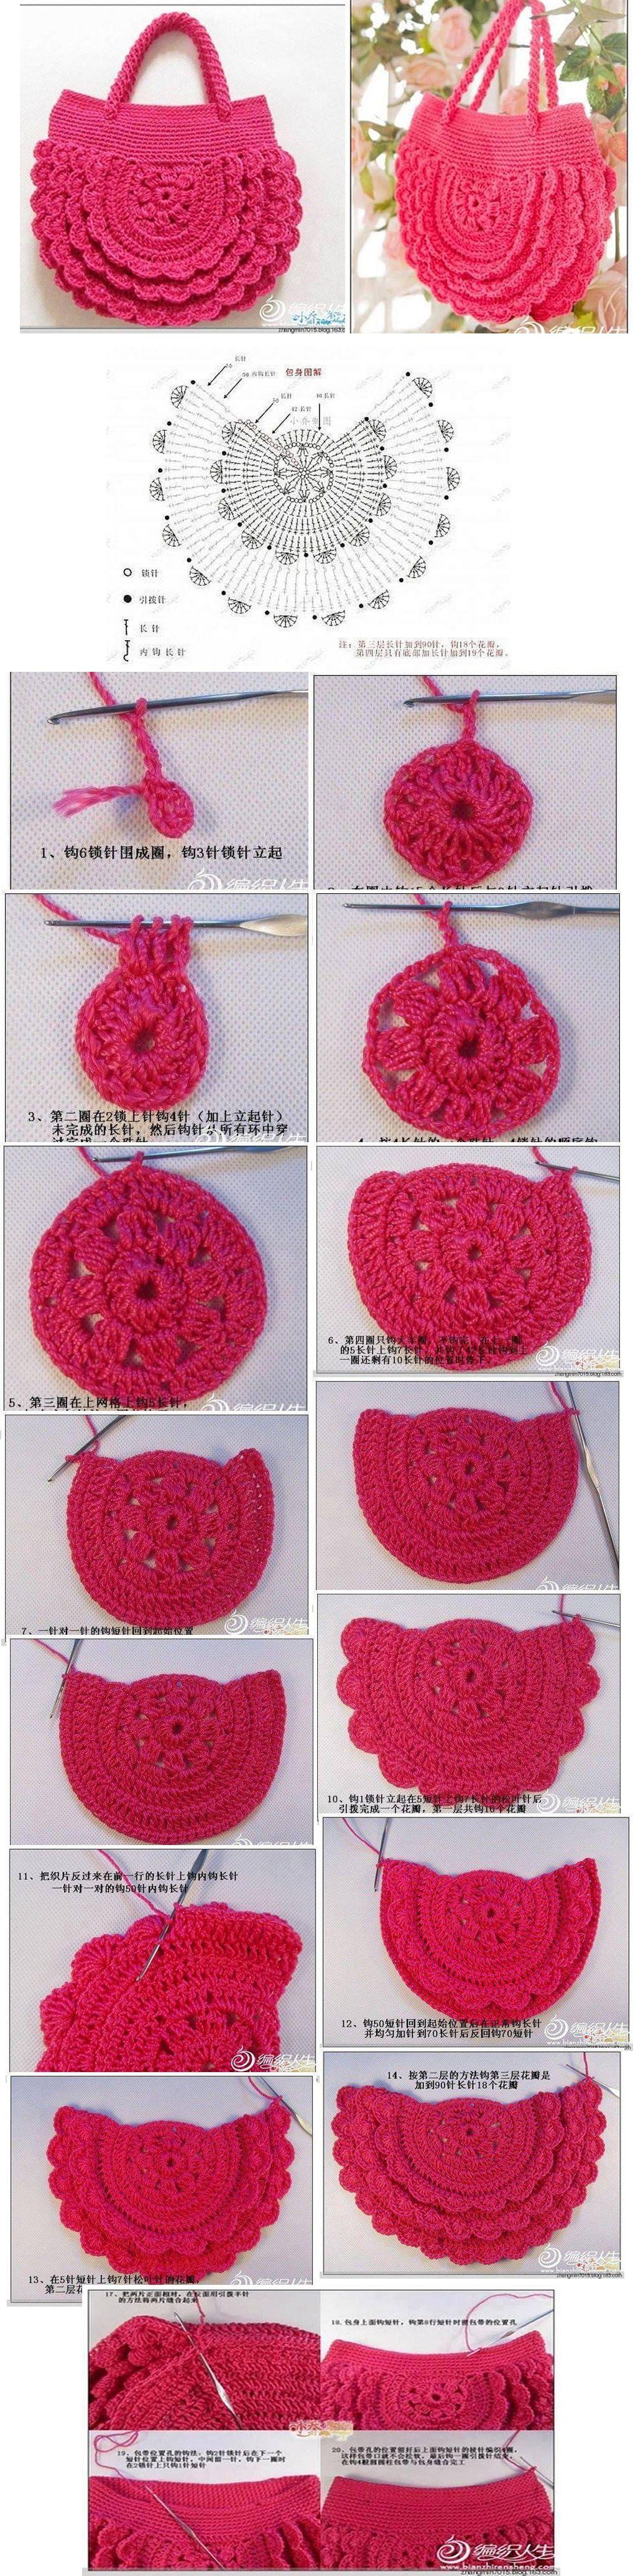 Bag circolare (pattern schema)